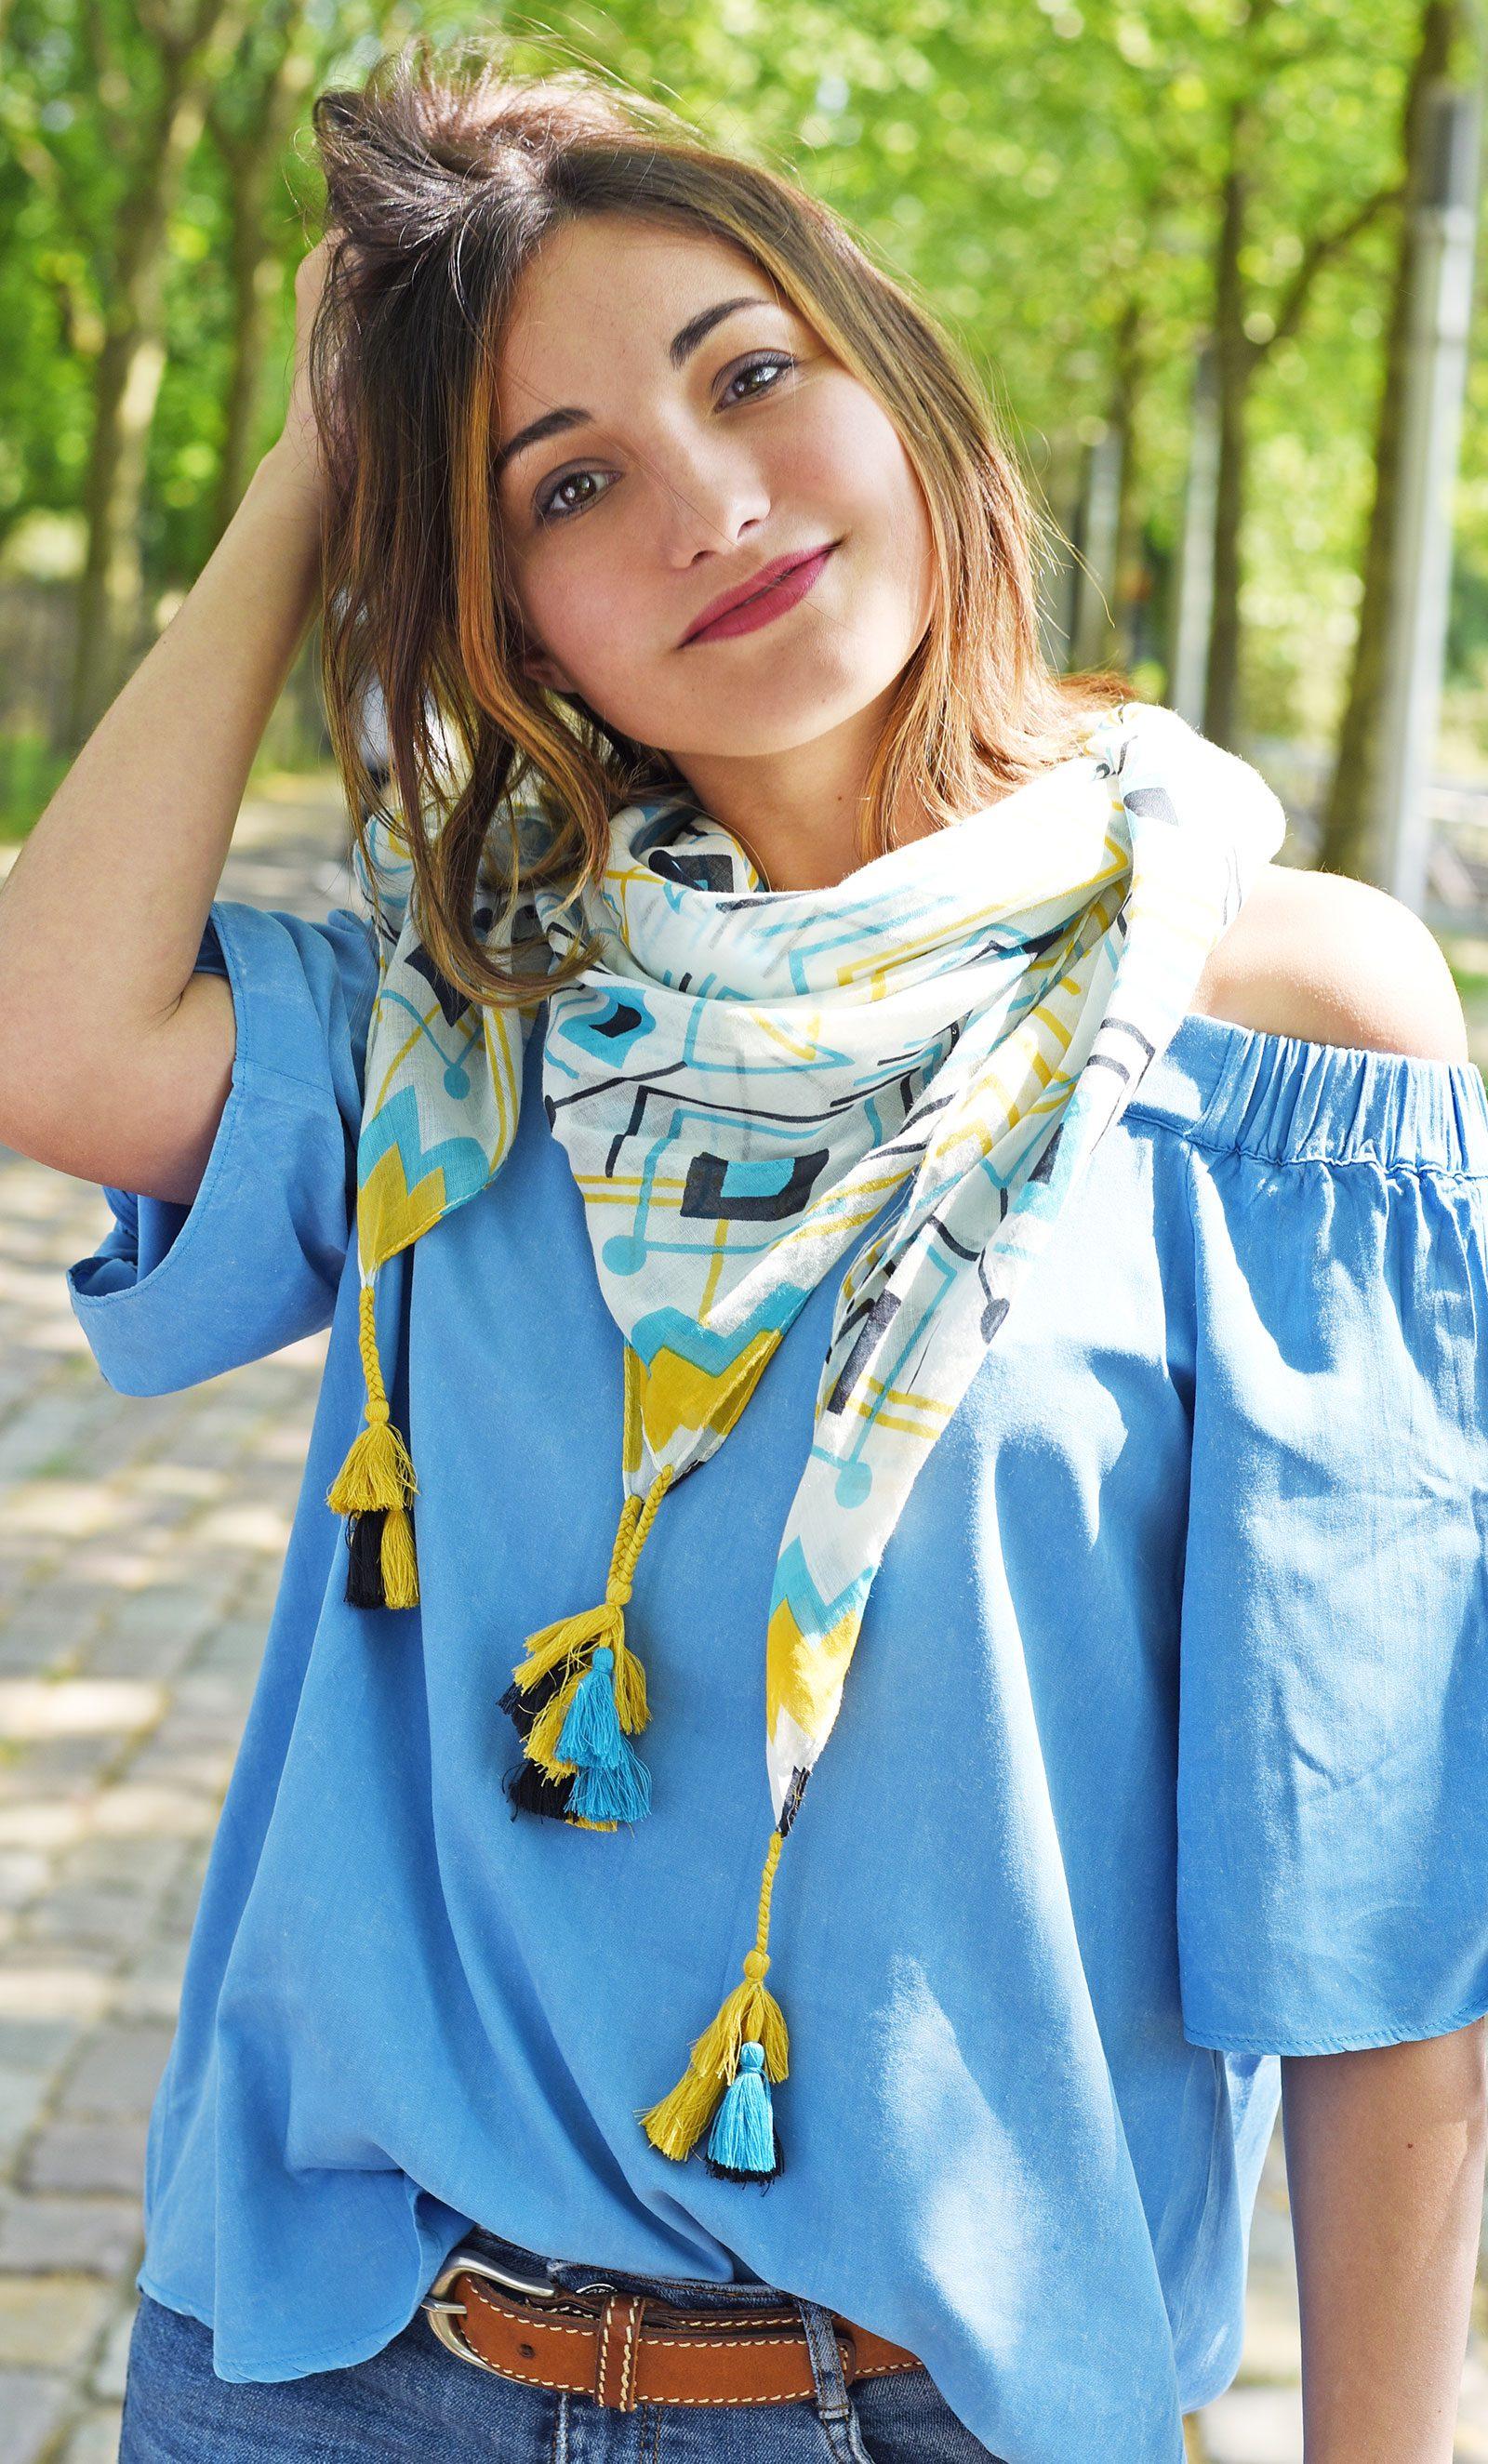 http://lookbook.allee-du-foulard.fr/wp-content/uploads/2018/06/0679-ADF-Accessoires-de-mode-LB-Coll_geometrique-chiapa-bleu-1-1600x2650.jpg